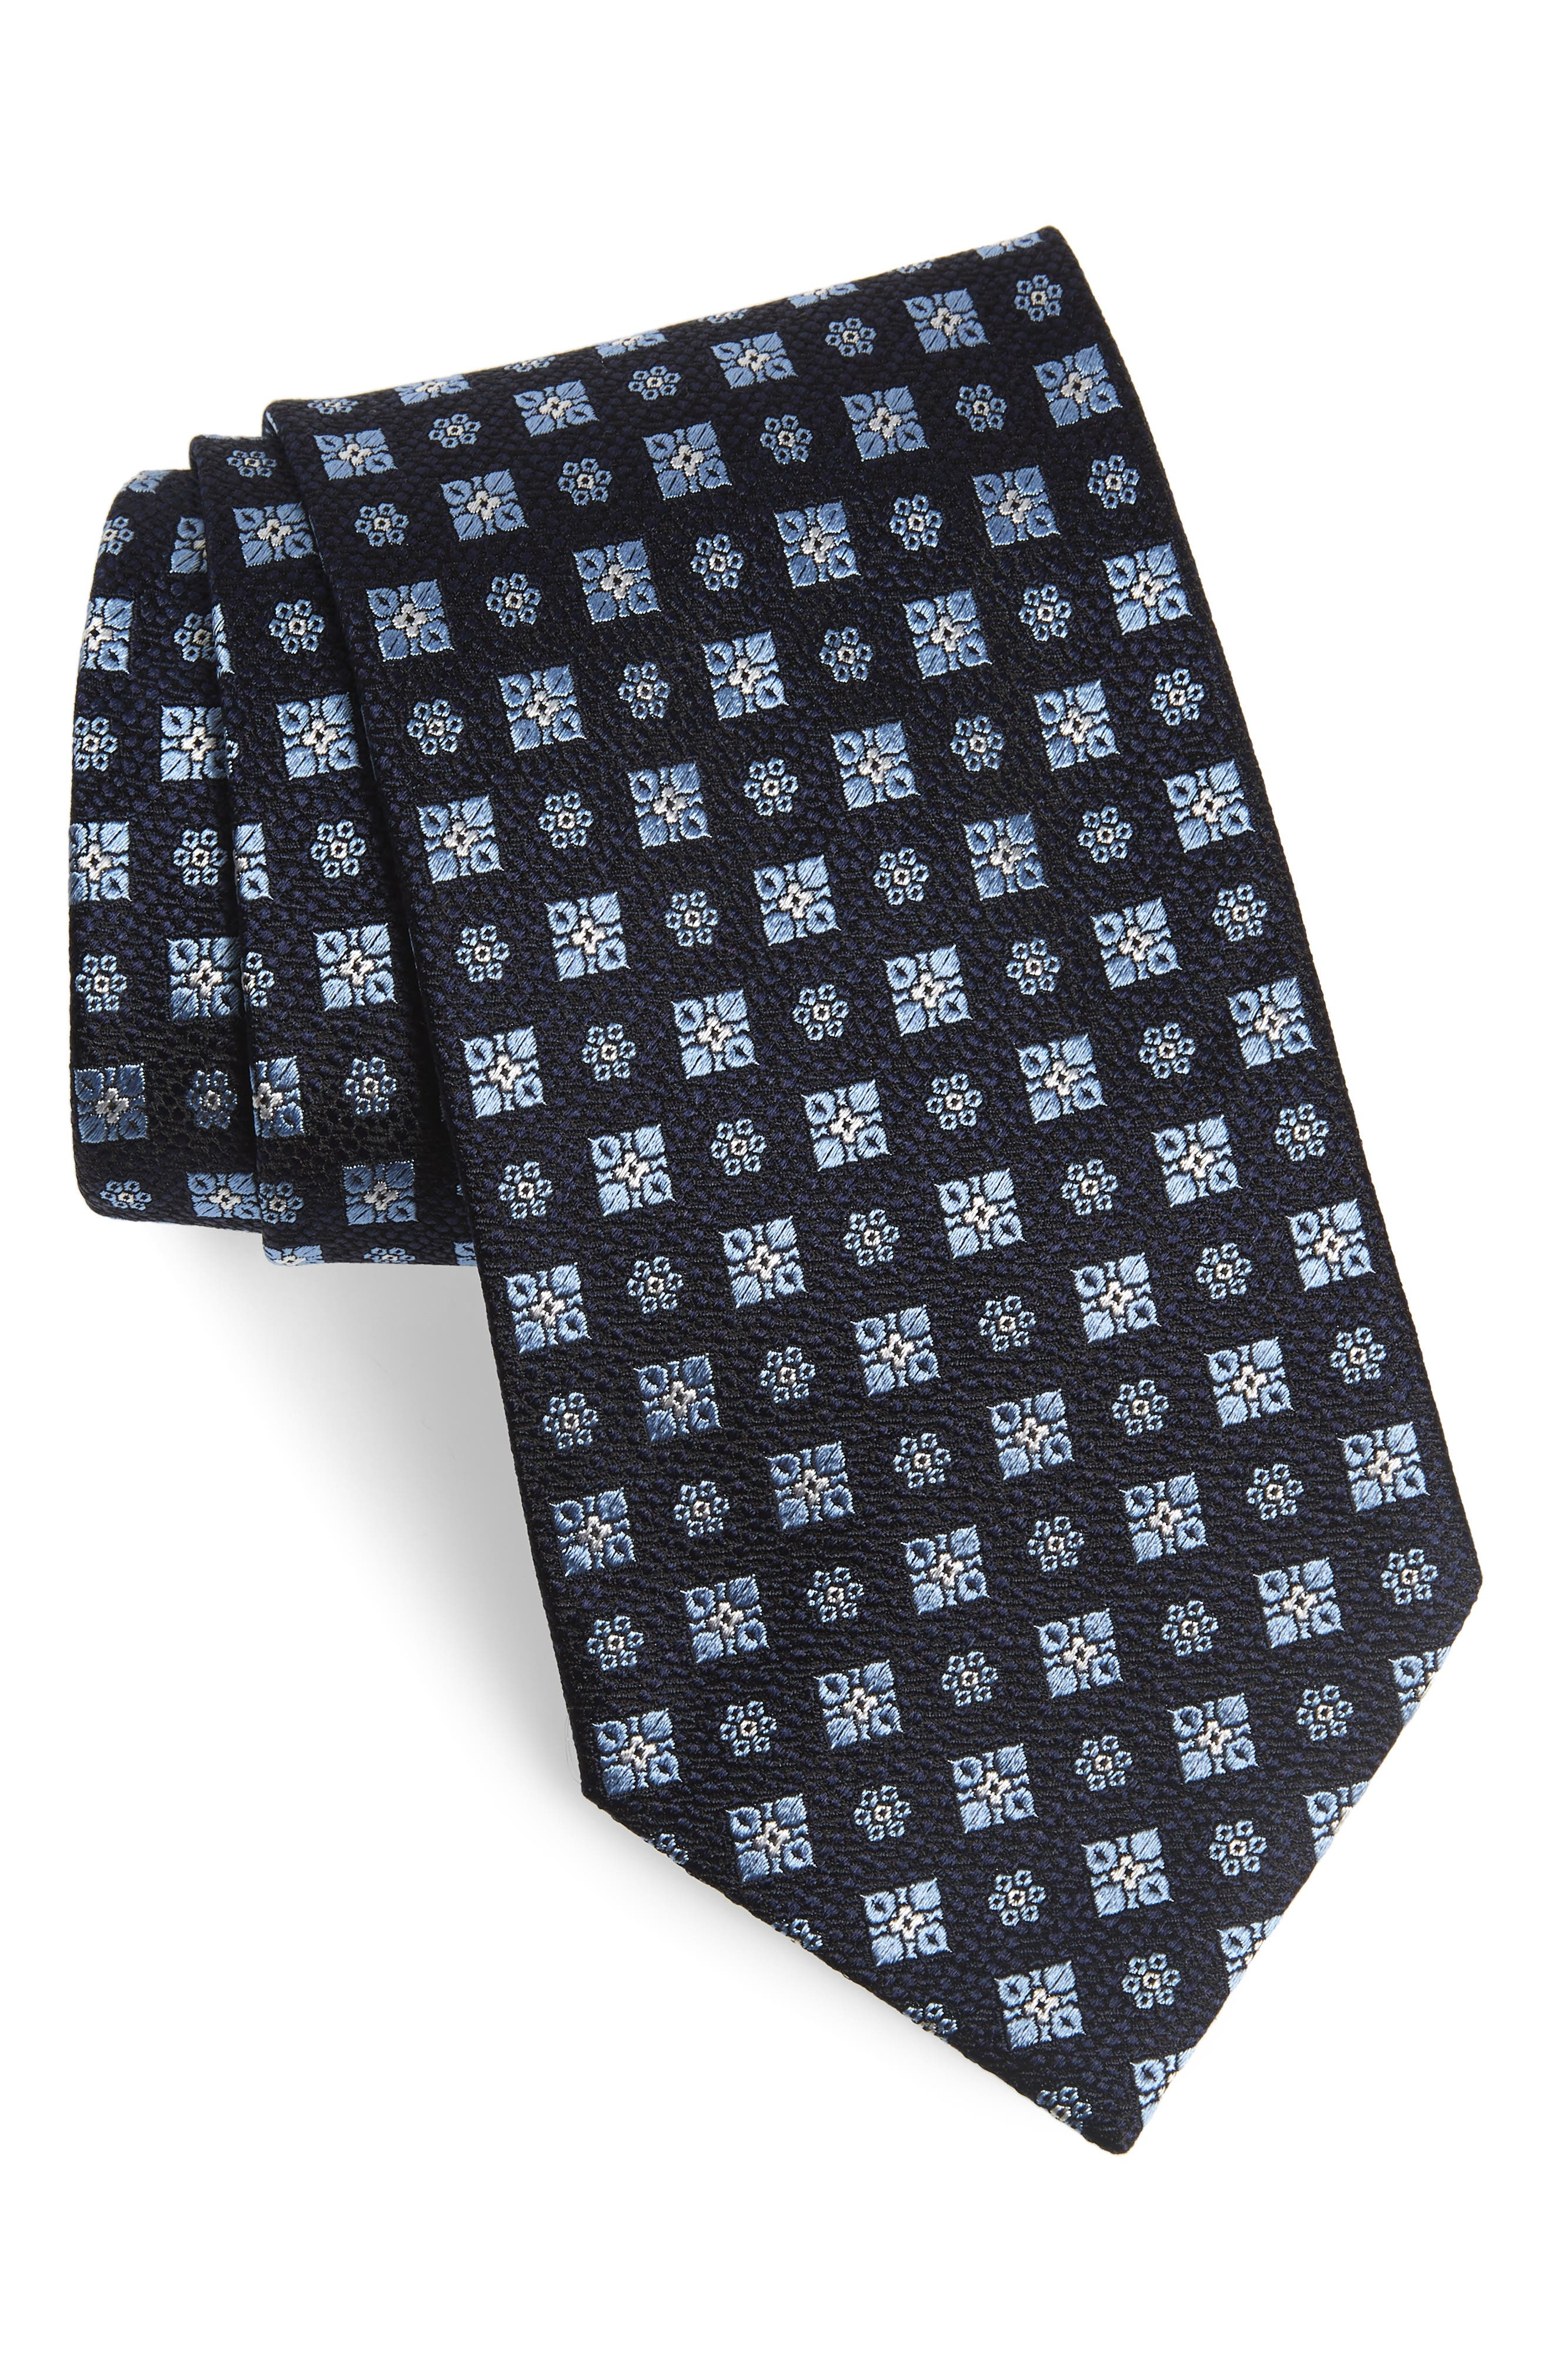 ERMENEGILDO ZEGNA, Medallion Silk X-Long Tie, Main thumbnail 1, color, BLUE